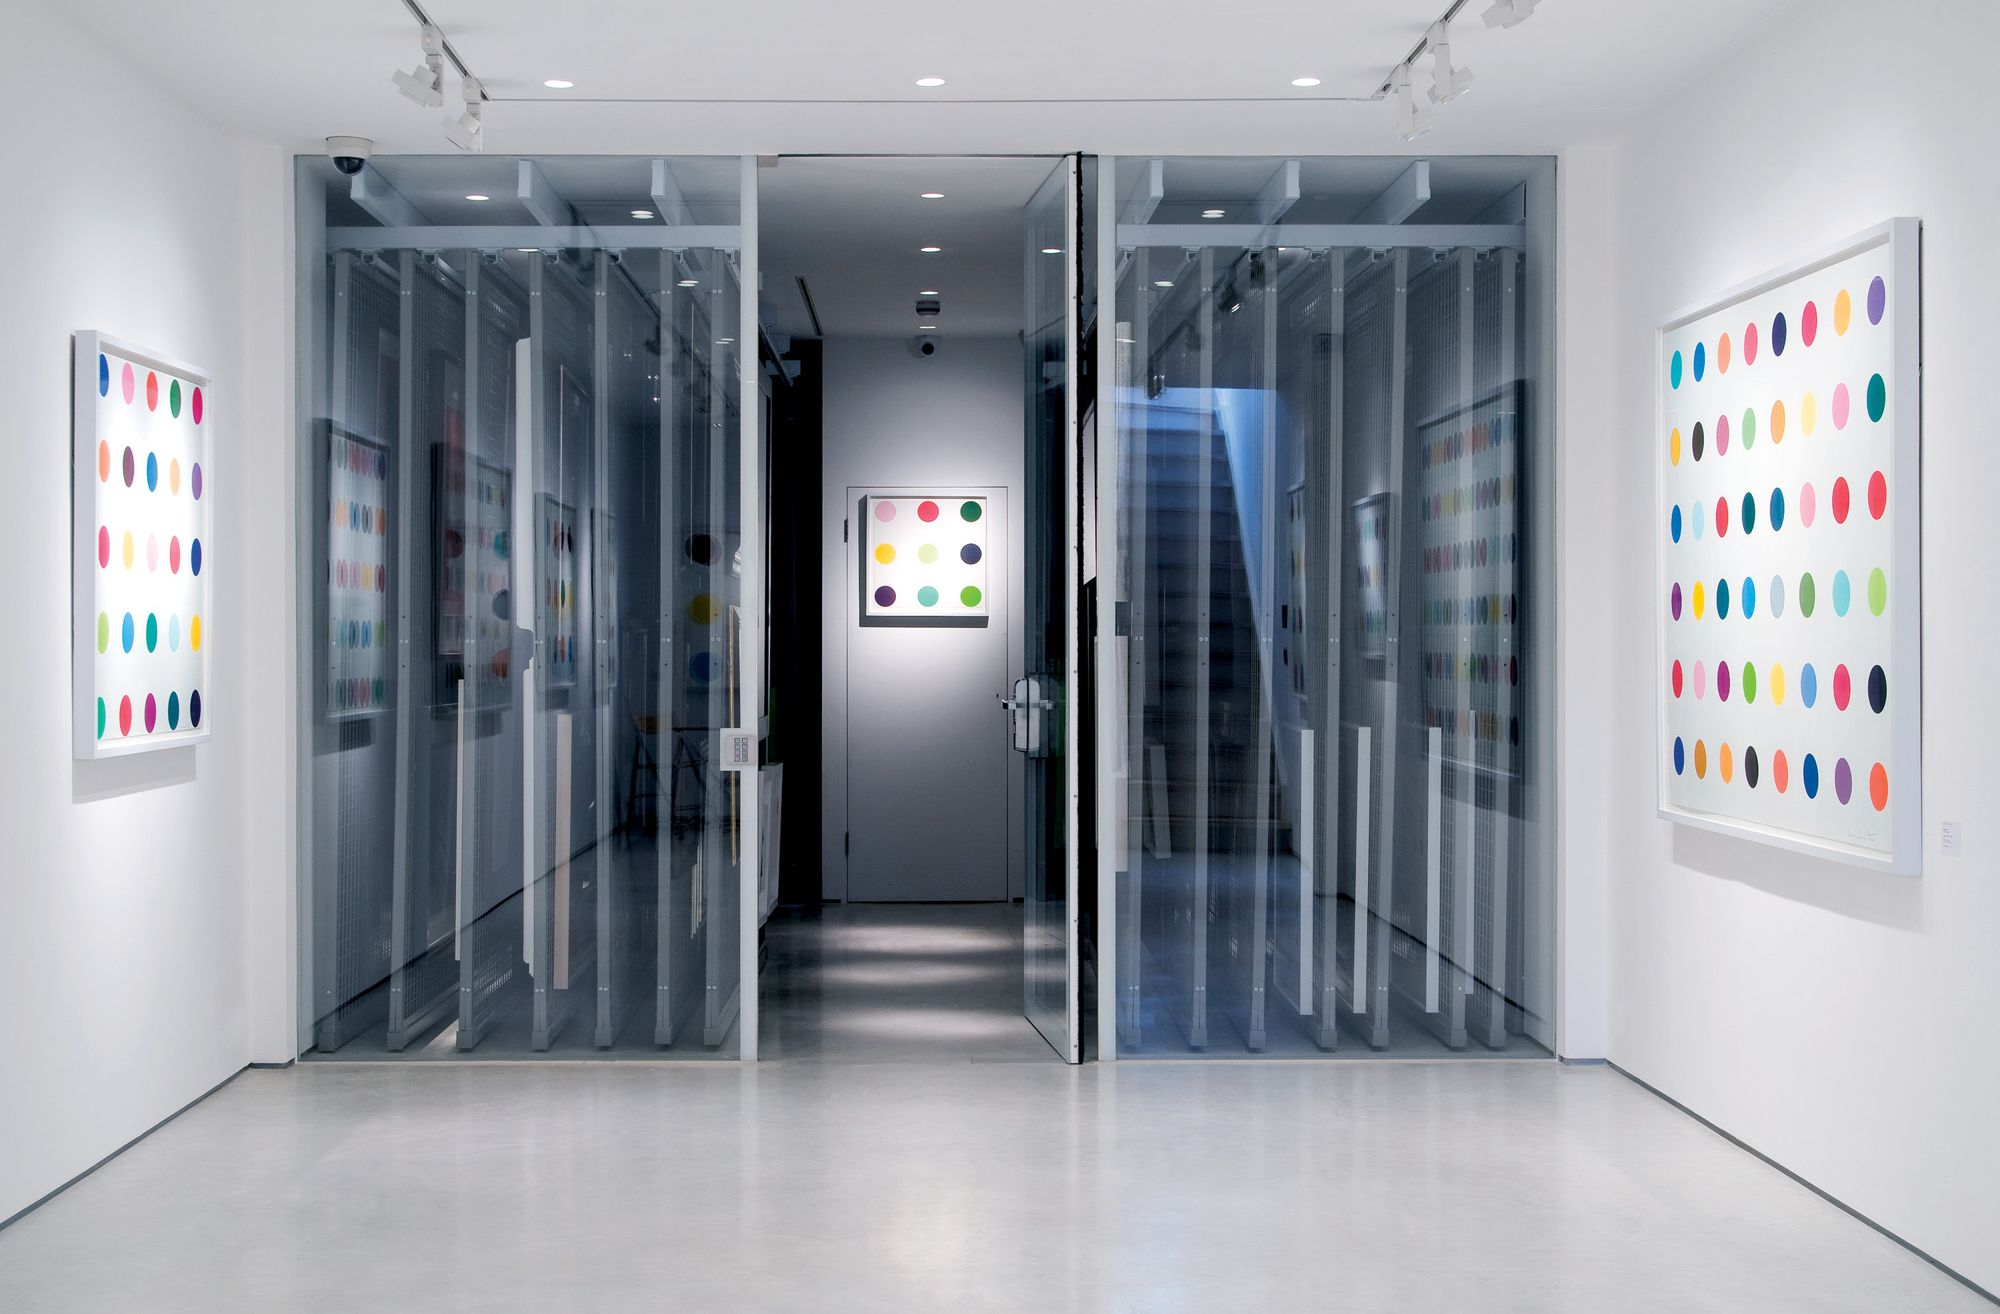 Andipa Gallery